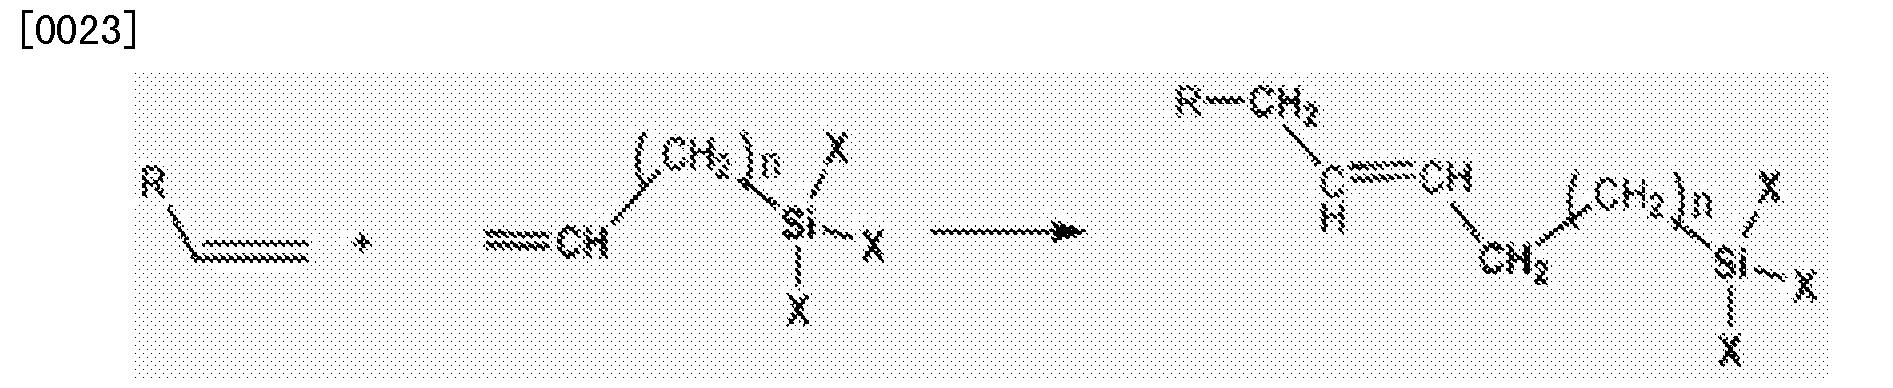 Figure CN105315486AD00071